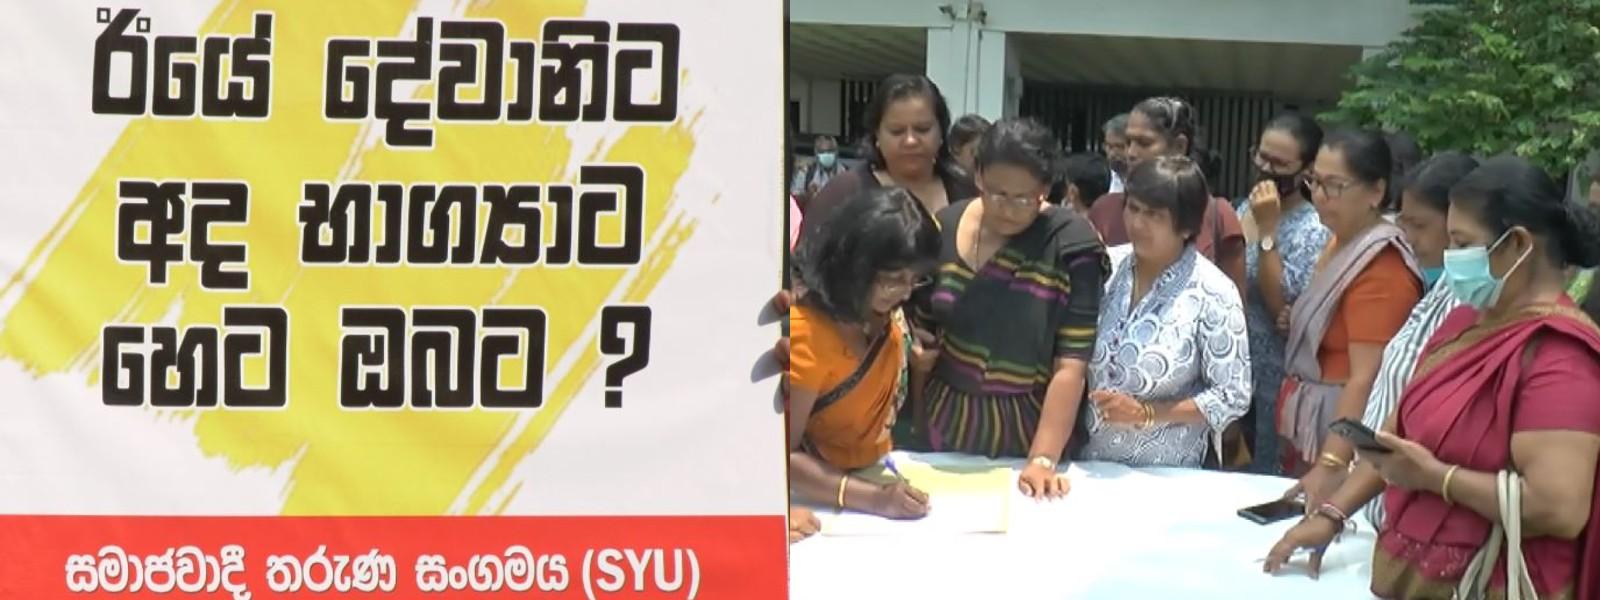 Multiple groups rally around Bhagya against harassment & deforestation